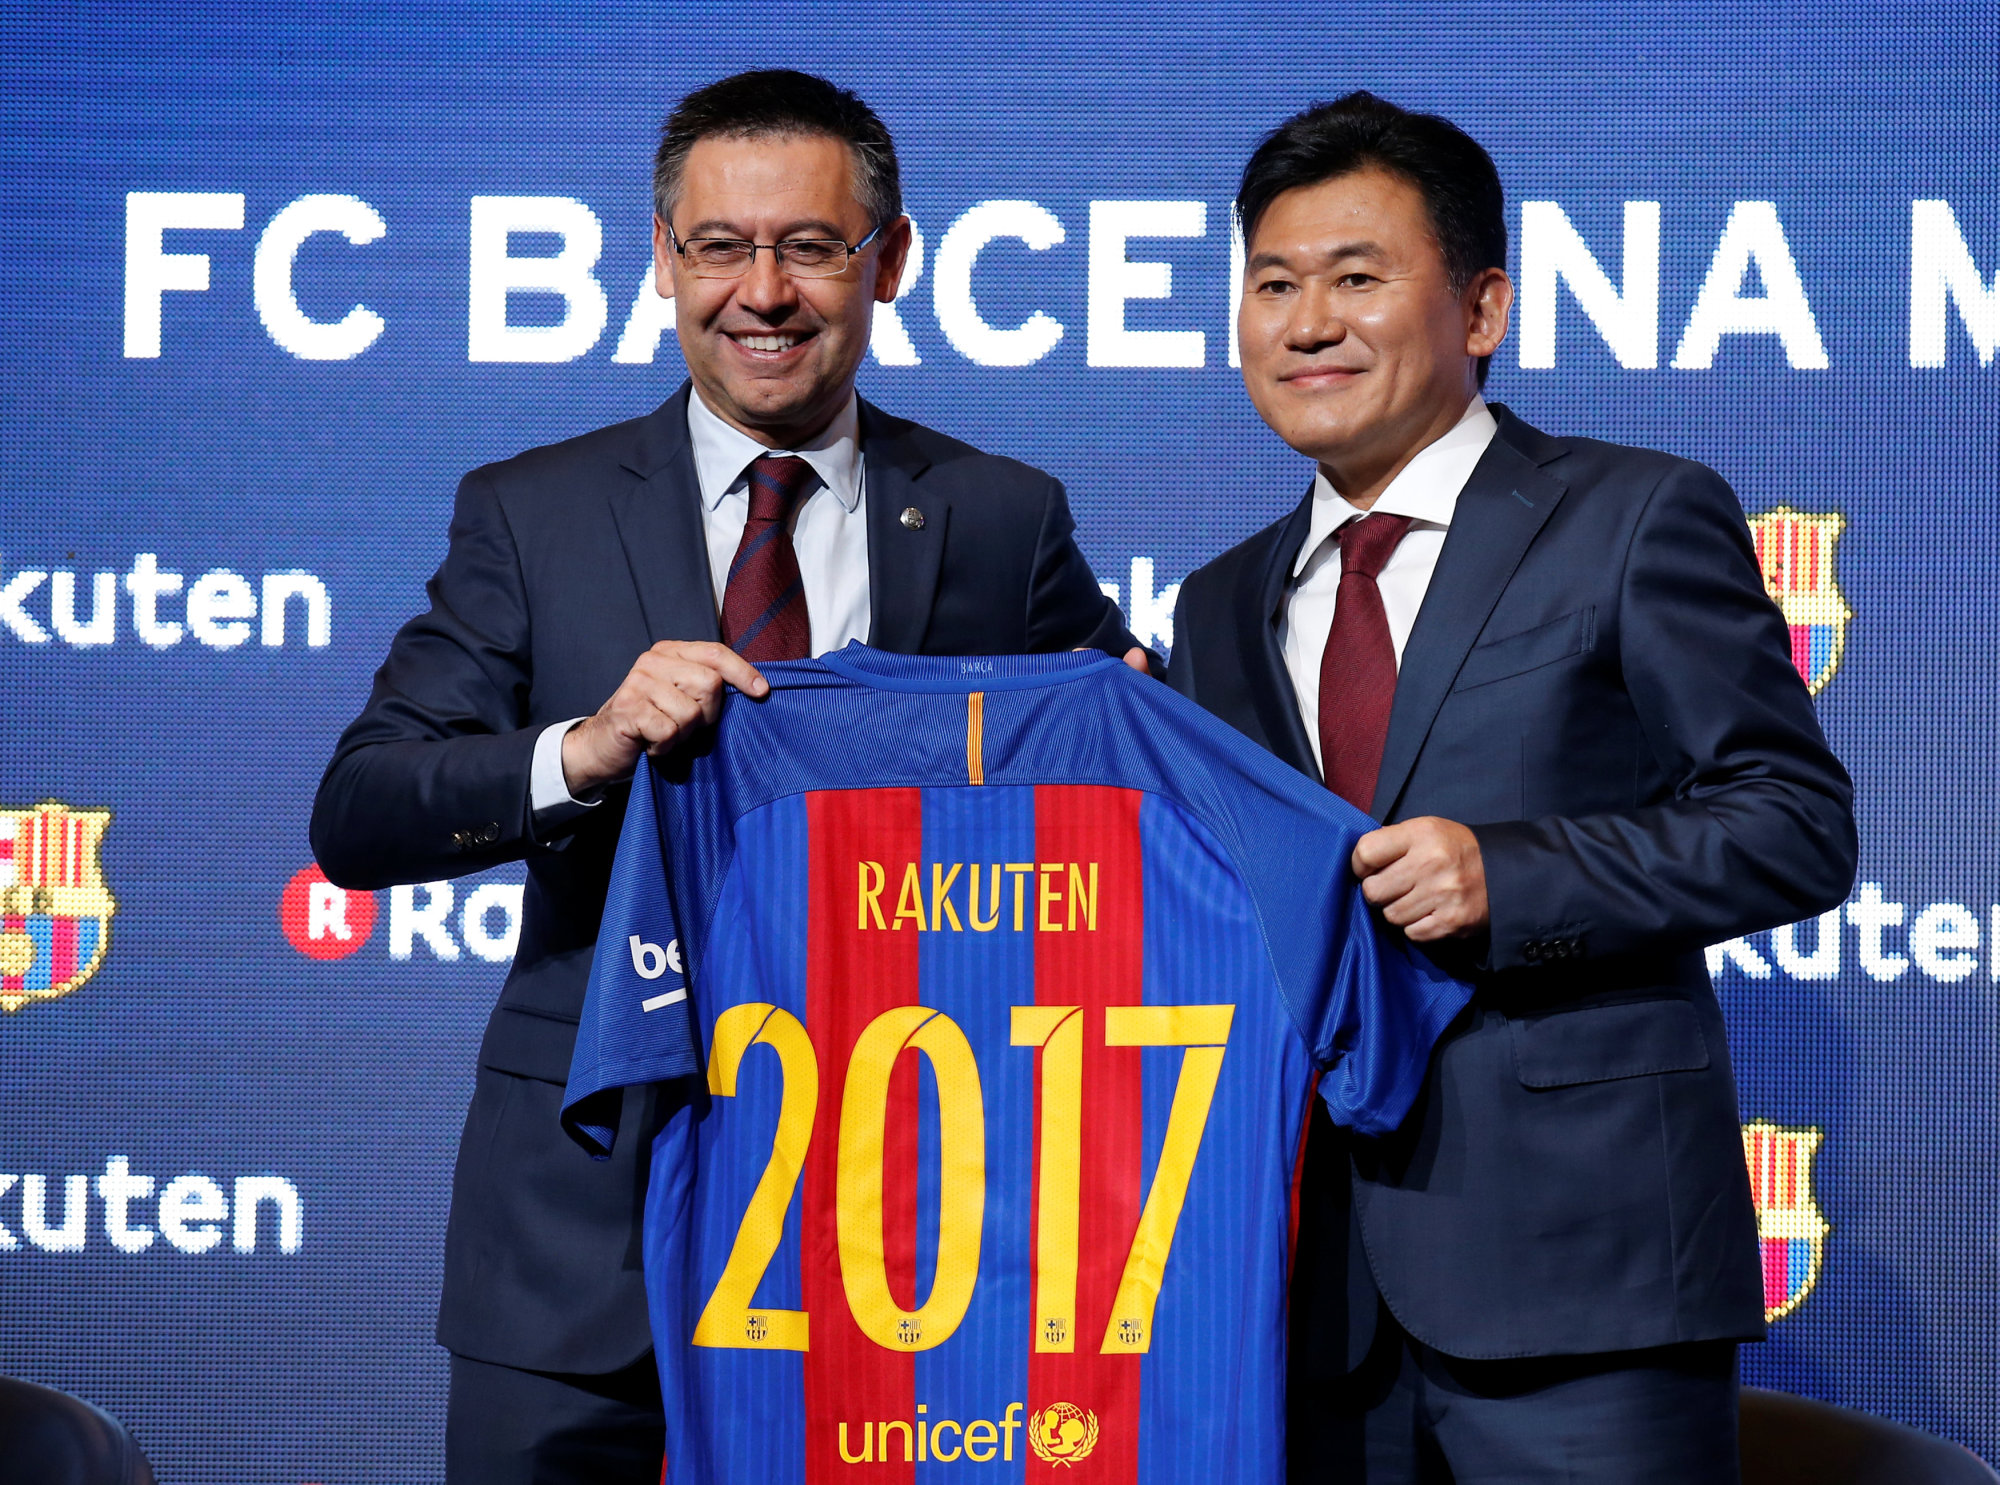 Fc Barcelona Signs Sponsorship Deal With Rakuten The Leader  # Muebles Rakuten